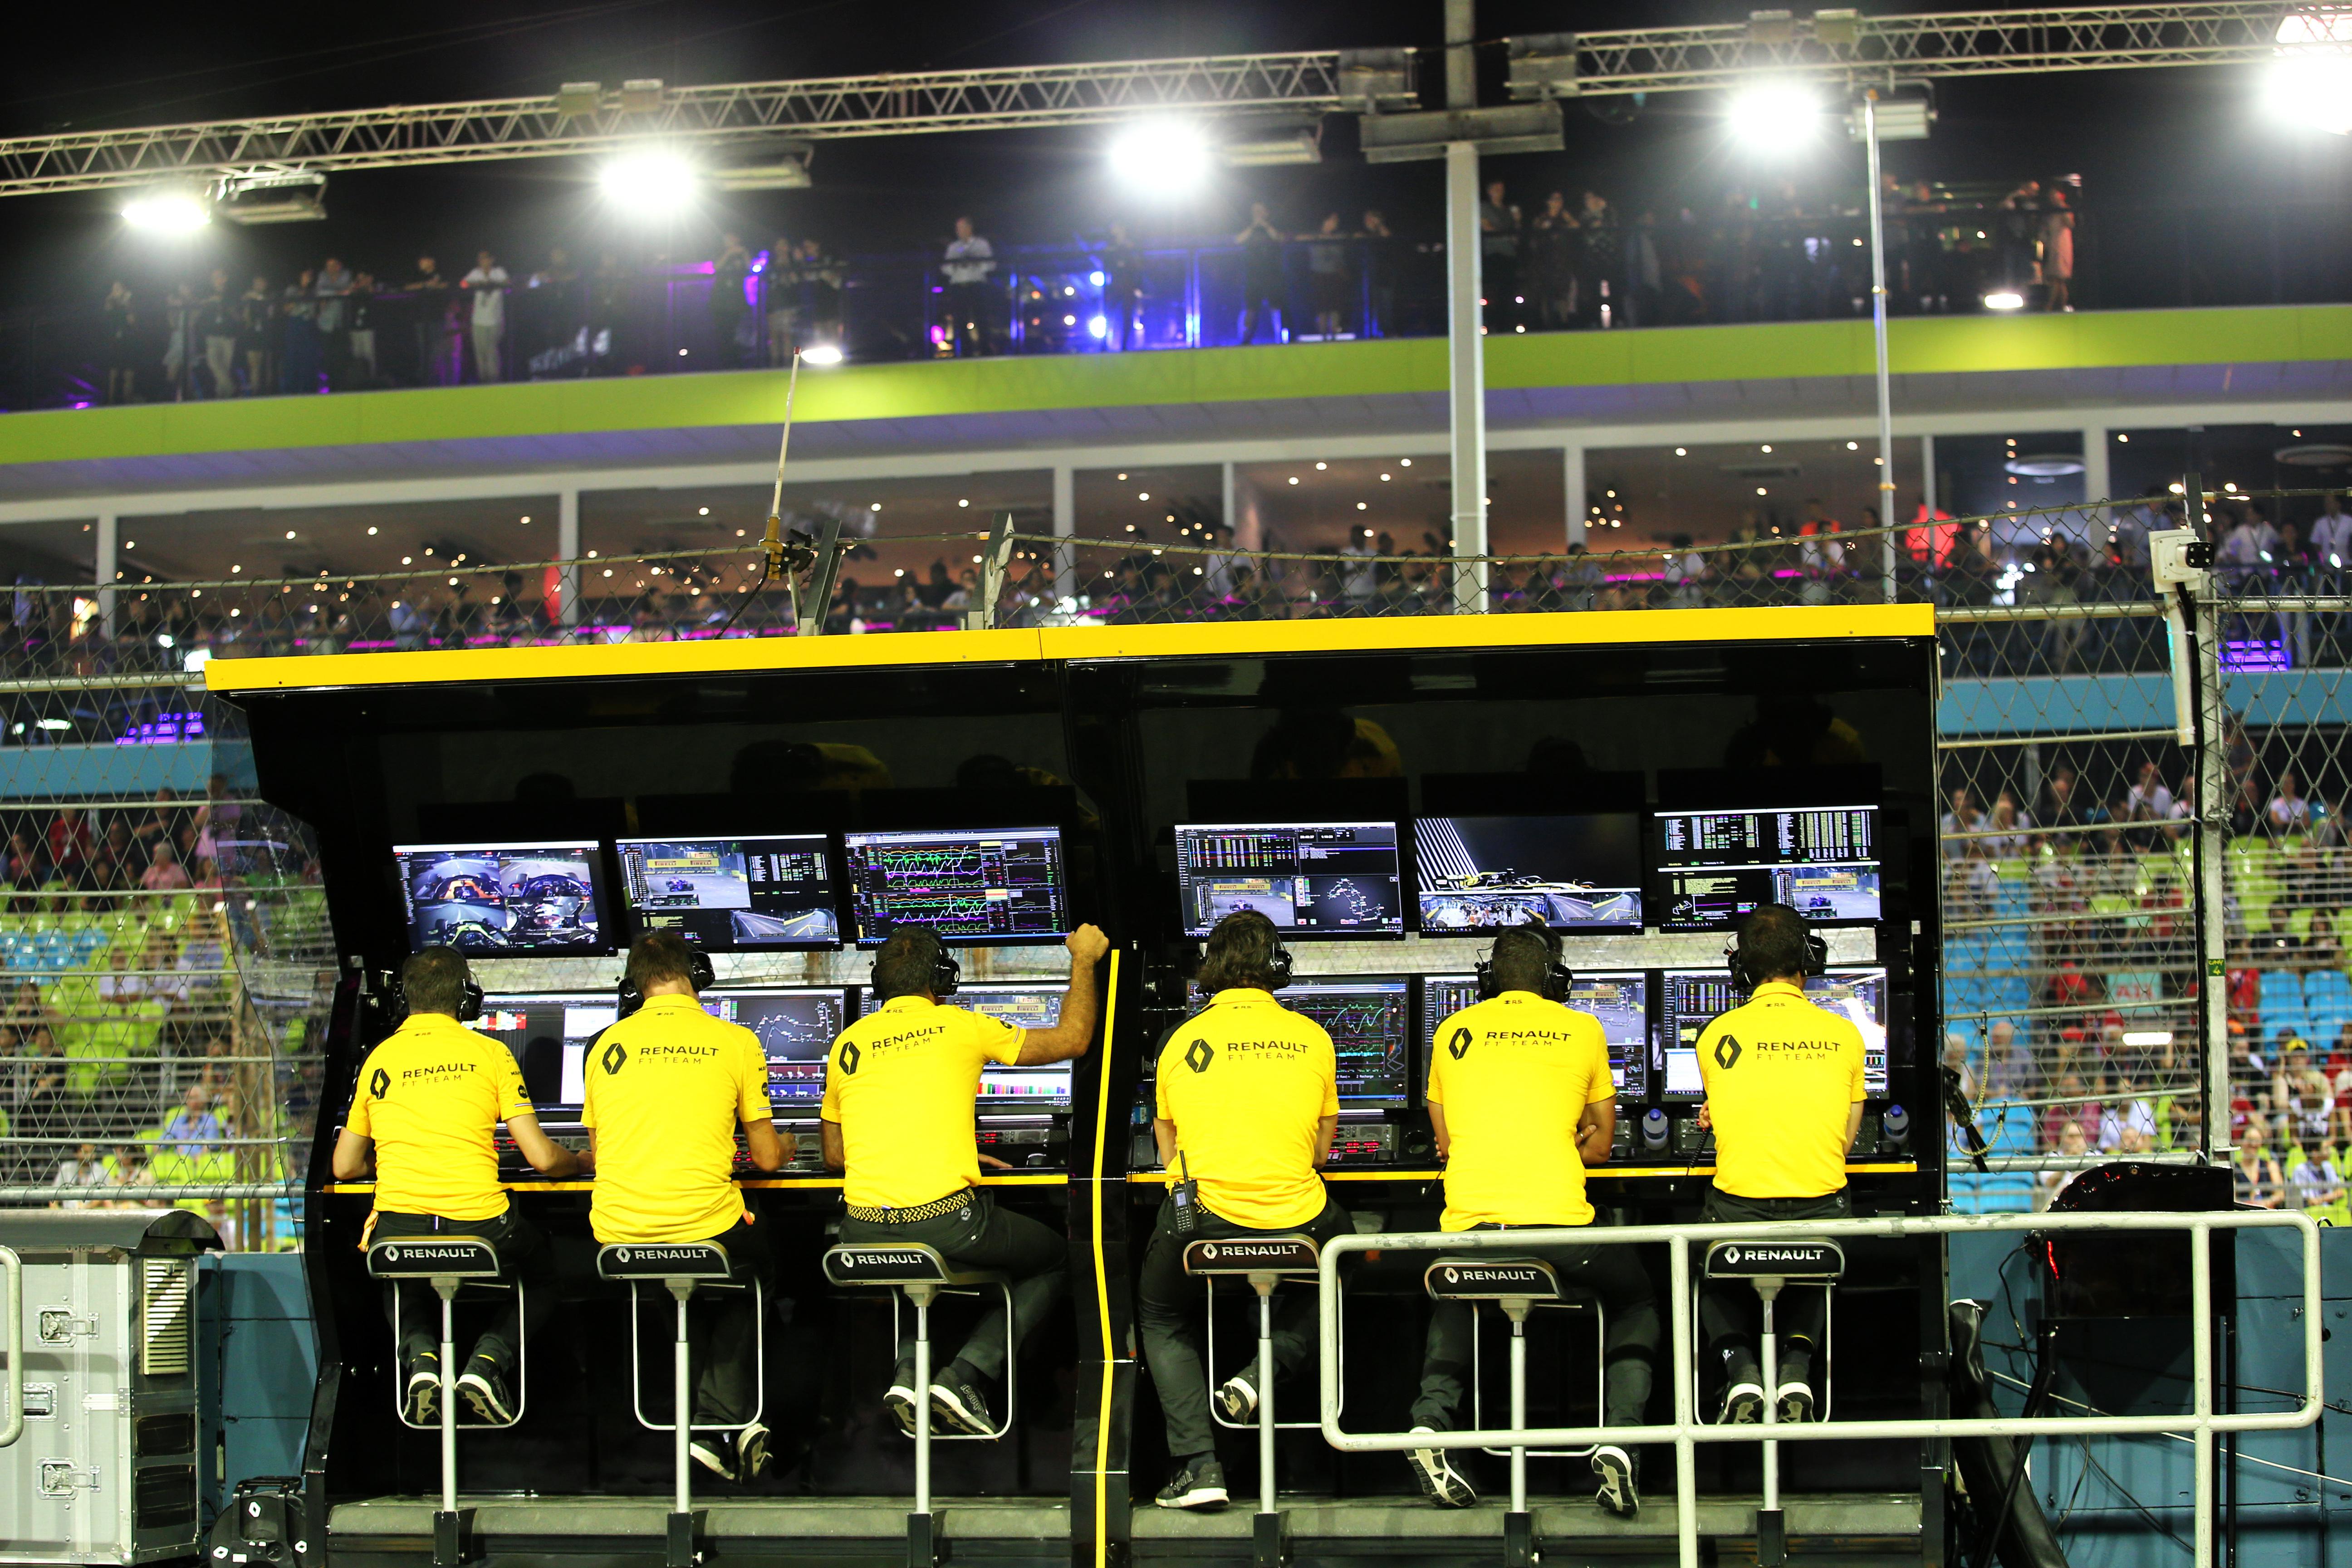 Motor Racing Formula One World Championship Singapore Grand Prix Practice Day Singapore, Singapore